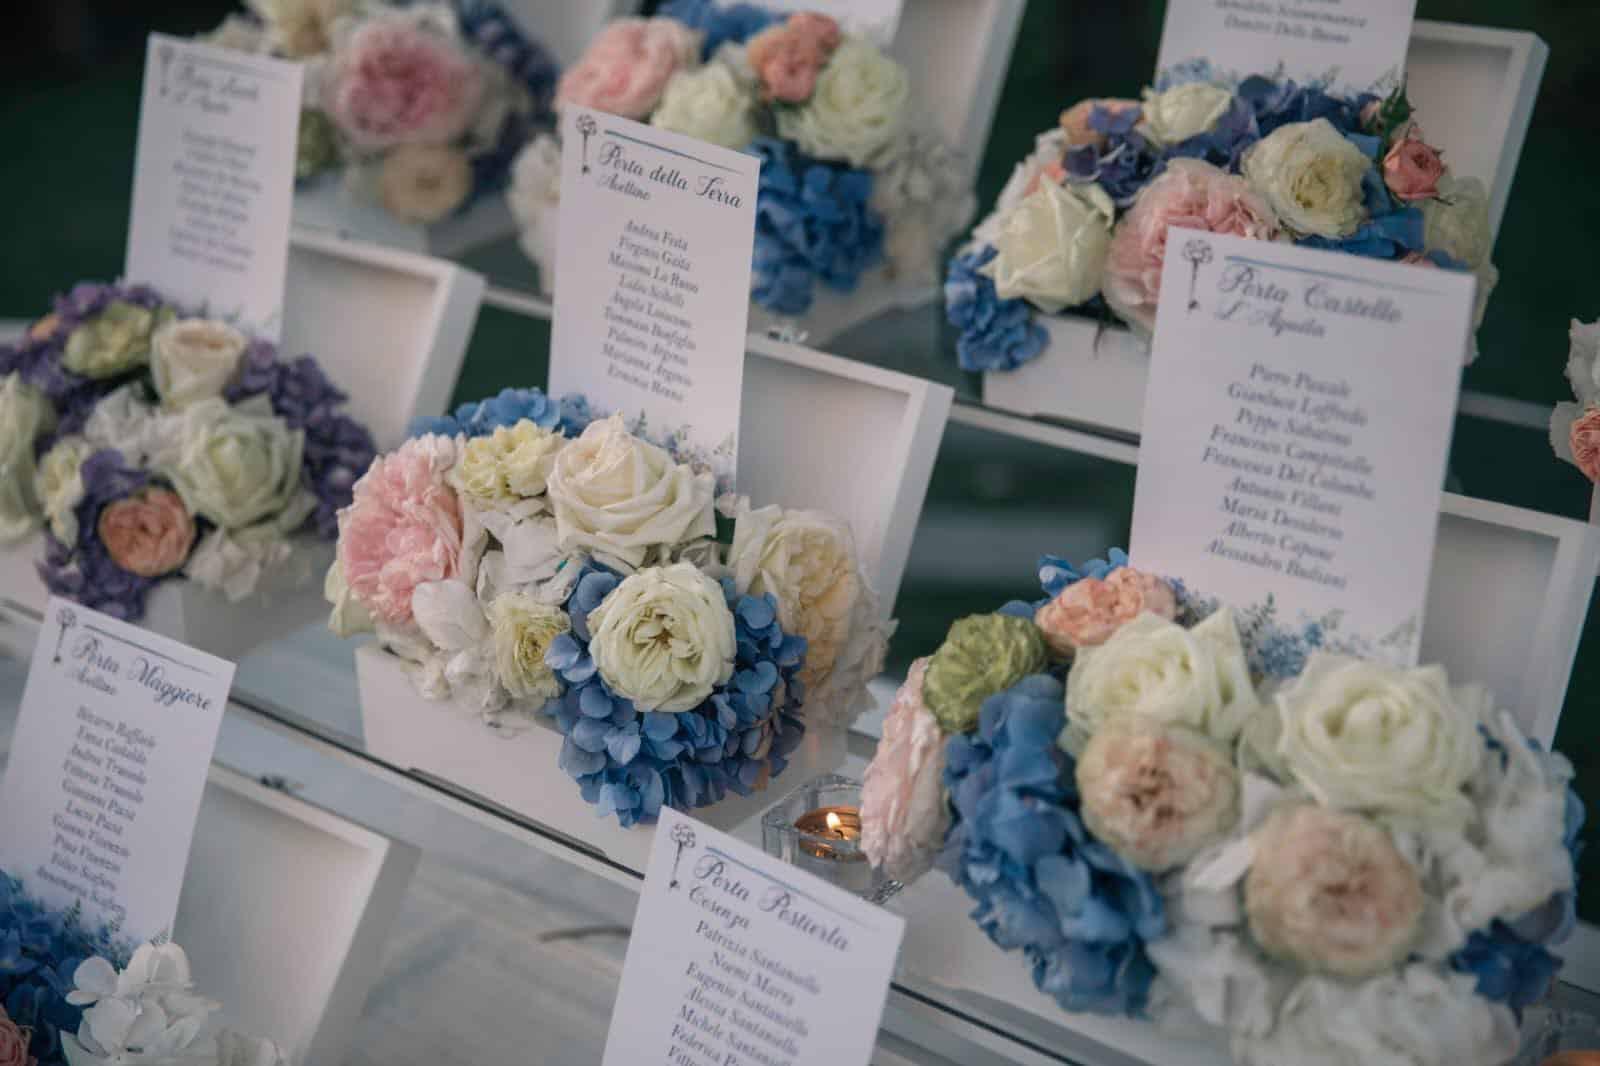 Matrimonio nel 2020 da rimandare? La parola alle wedding planner Imma ed Emanuela